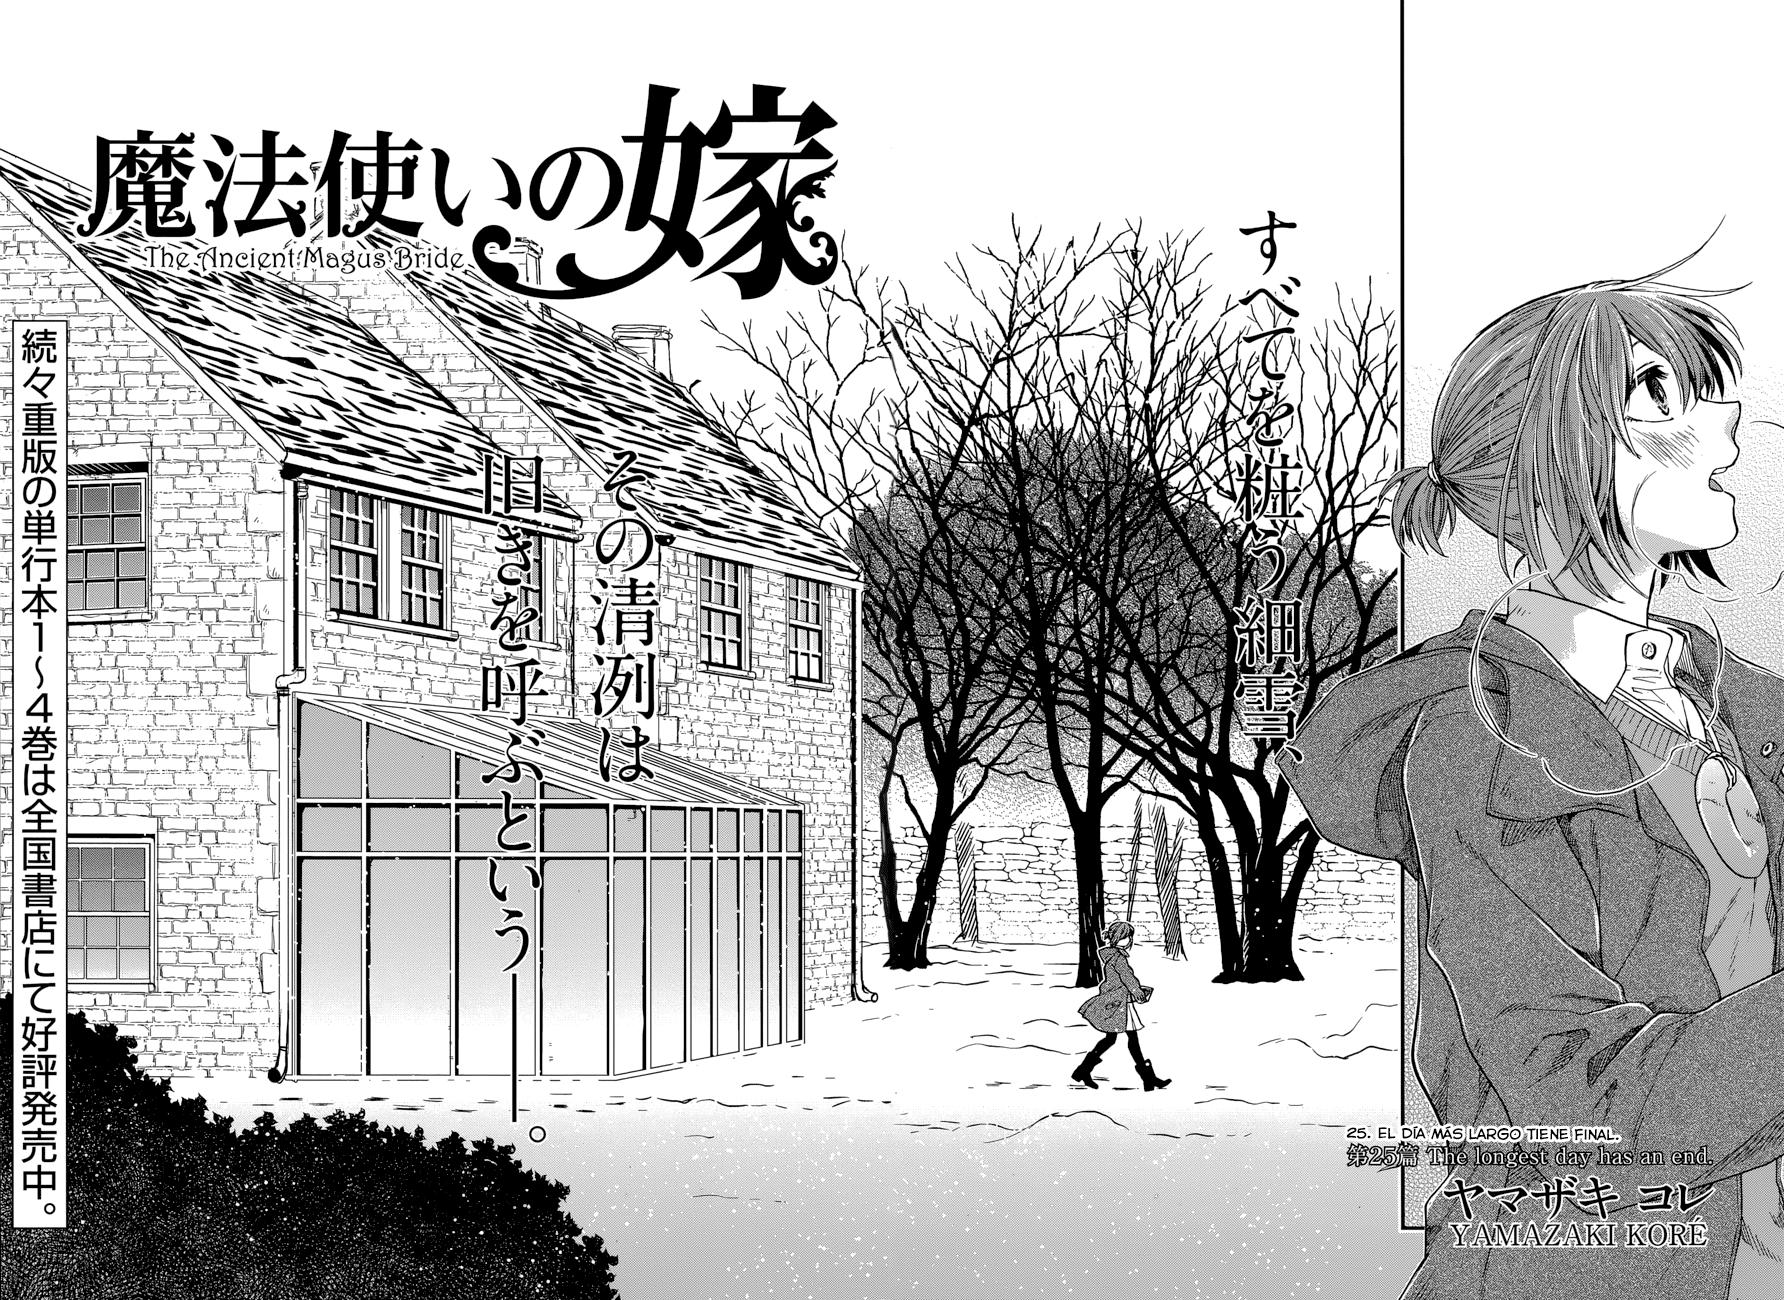 http://c5.ninemanga.com/es_manga/53/181/450617/f8b64946ebc86a5e23e1605a2943210c.jpg Page 3